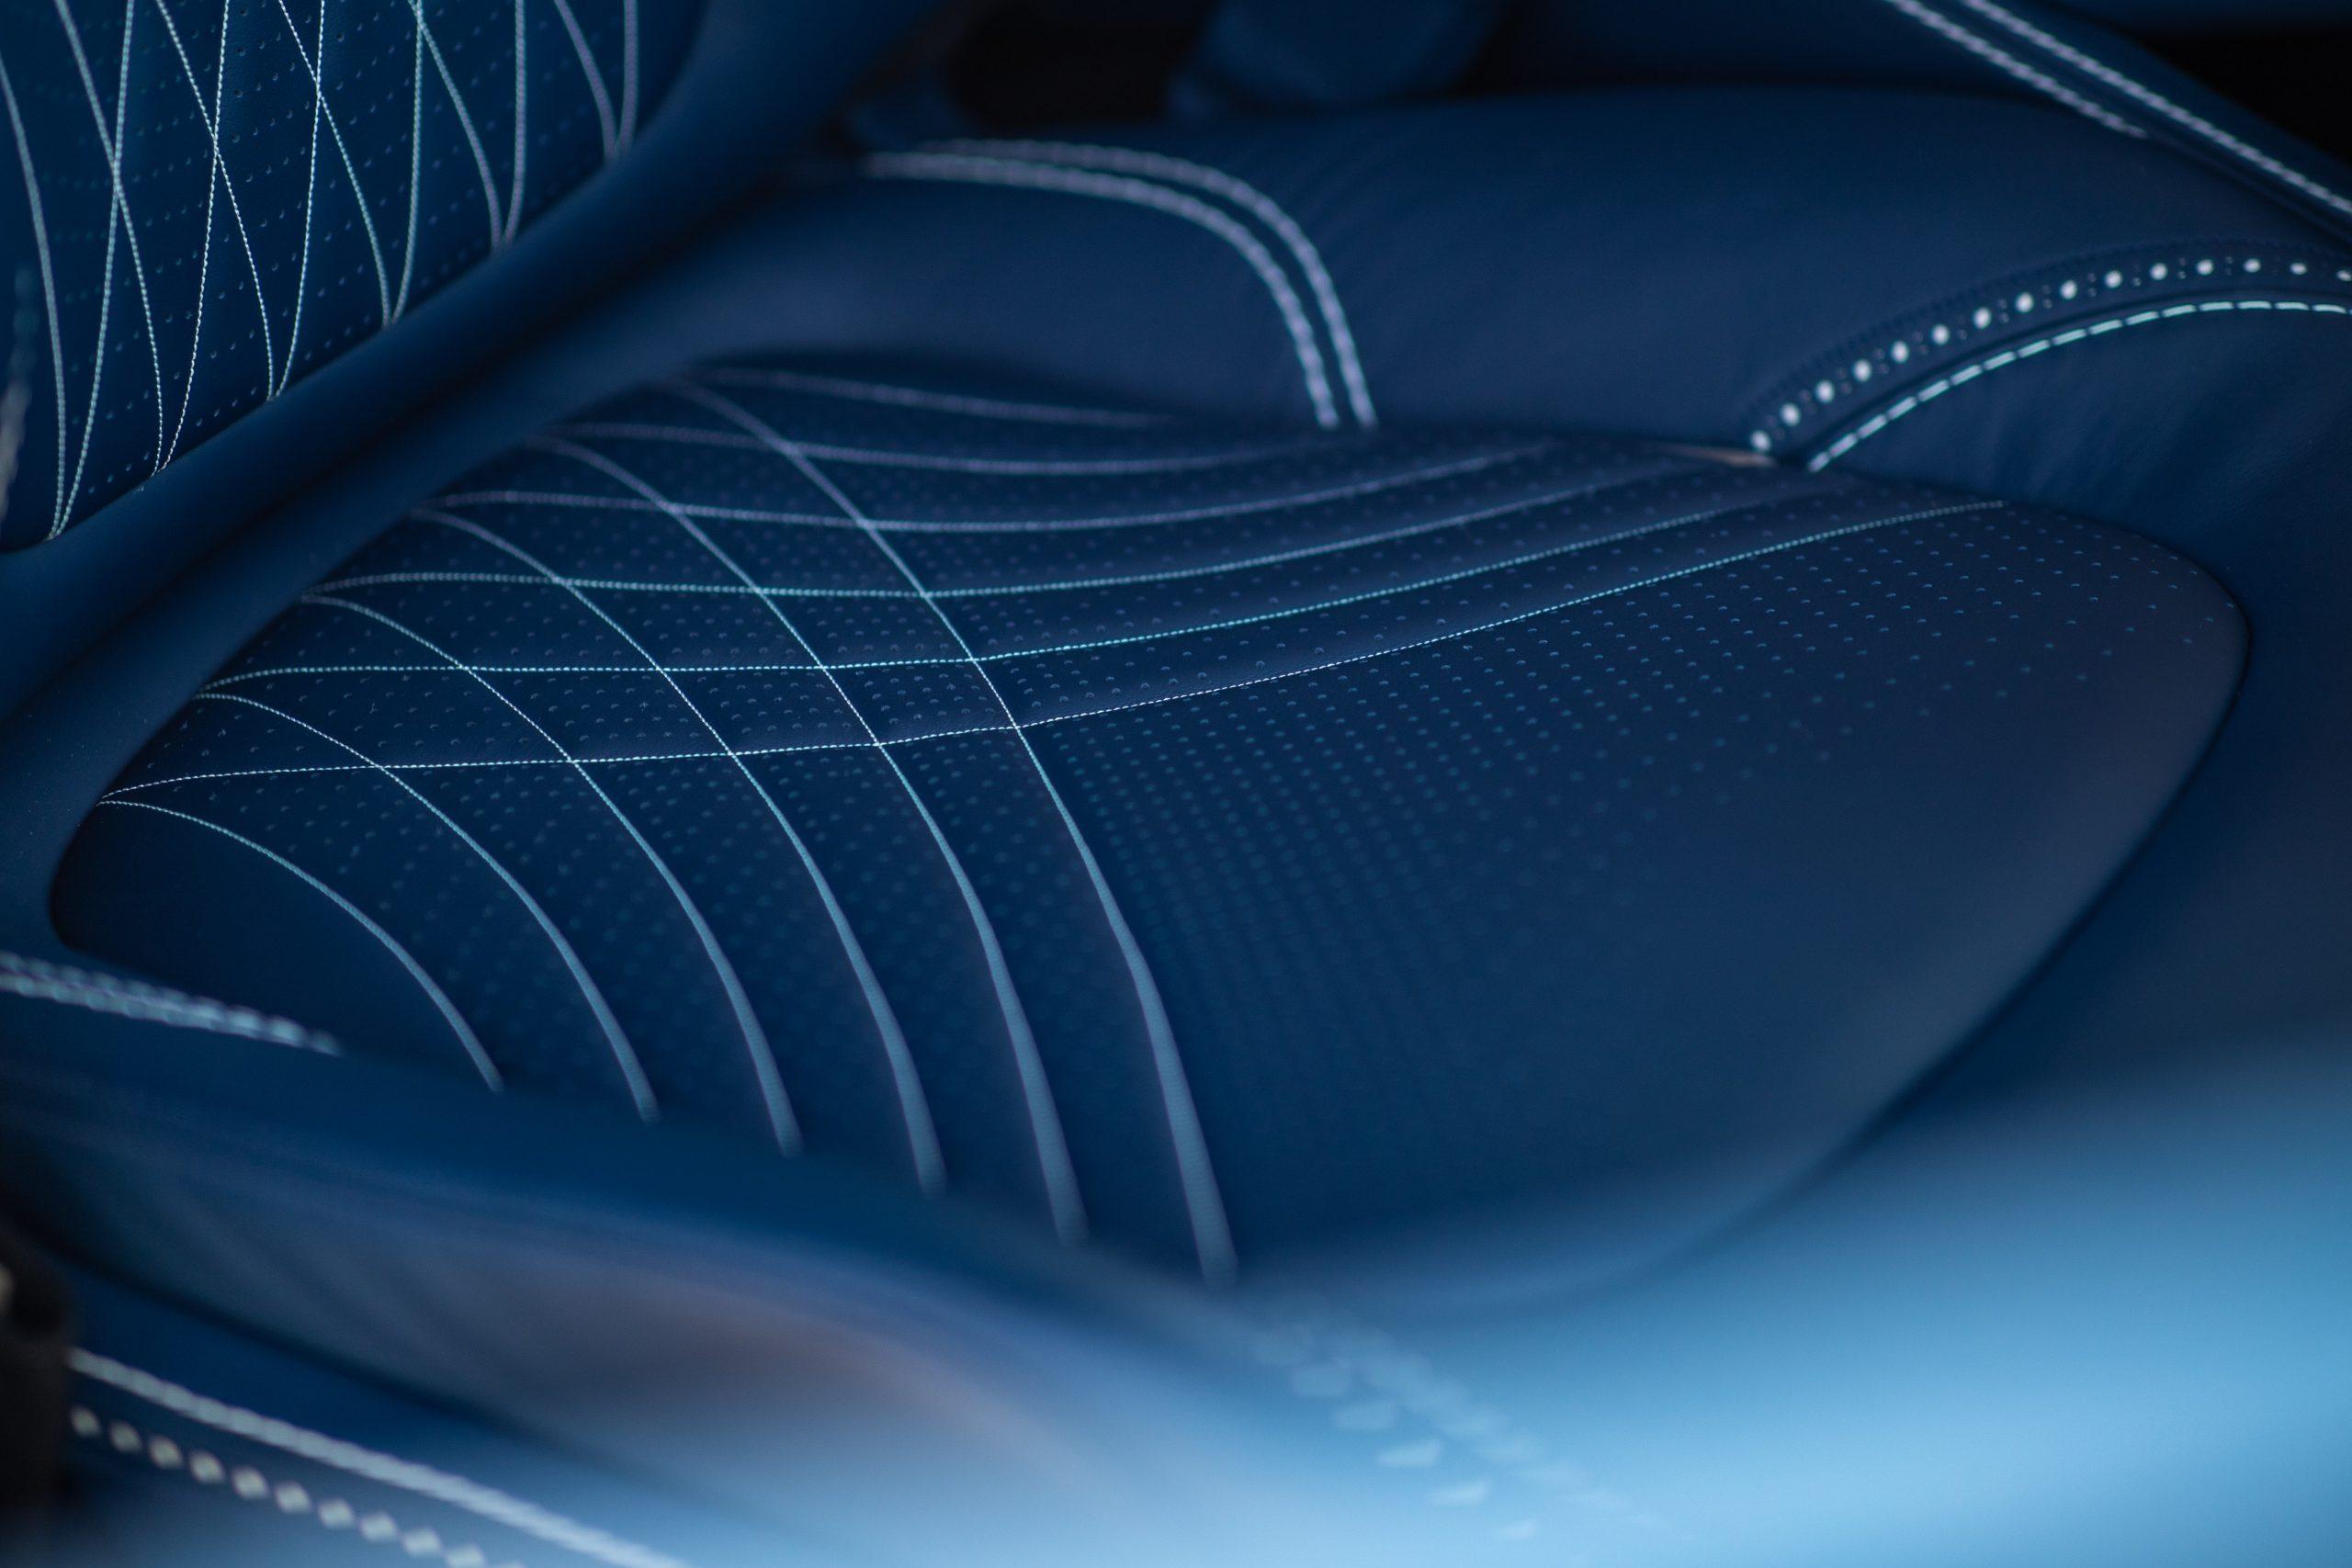 2021 Aston Martin DBX interior seat detail